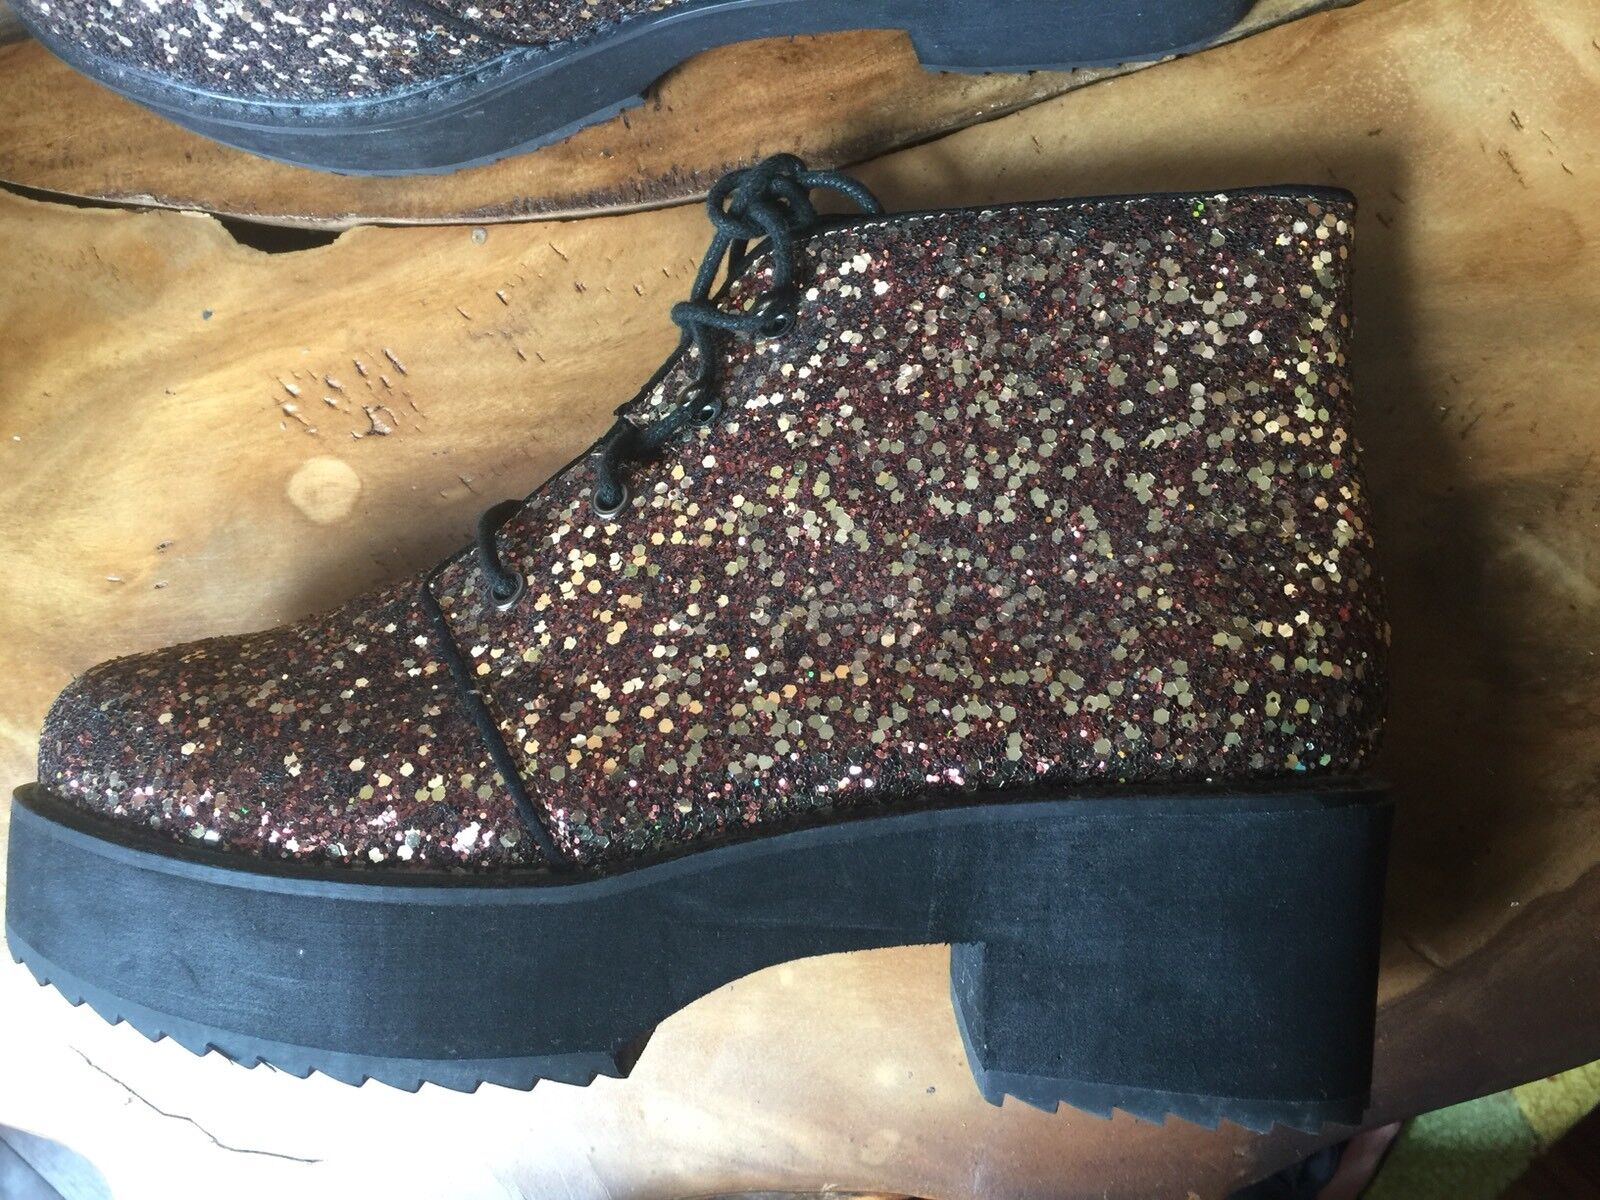 ASOS Bronze 8 Glitter Ankle Platform Stiefel 8 Bronze New 63e3e0